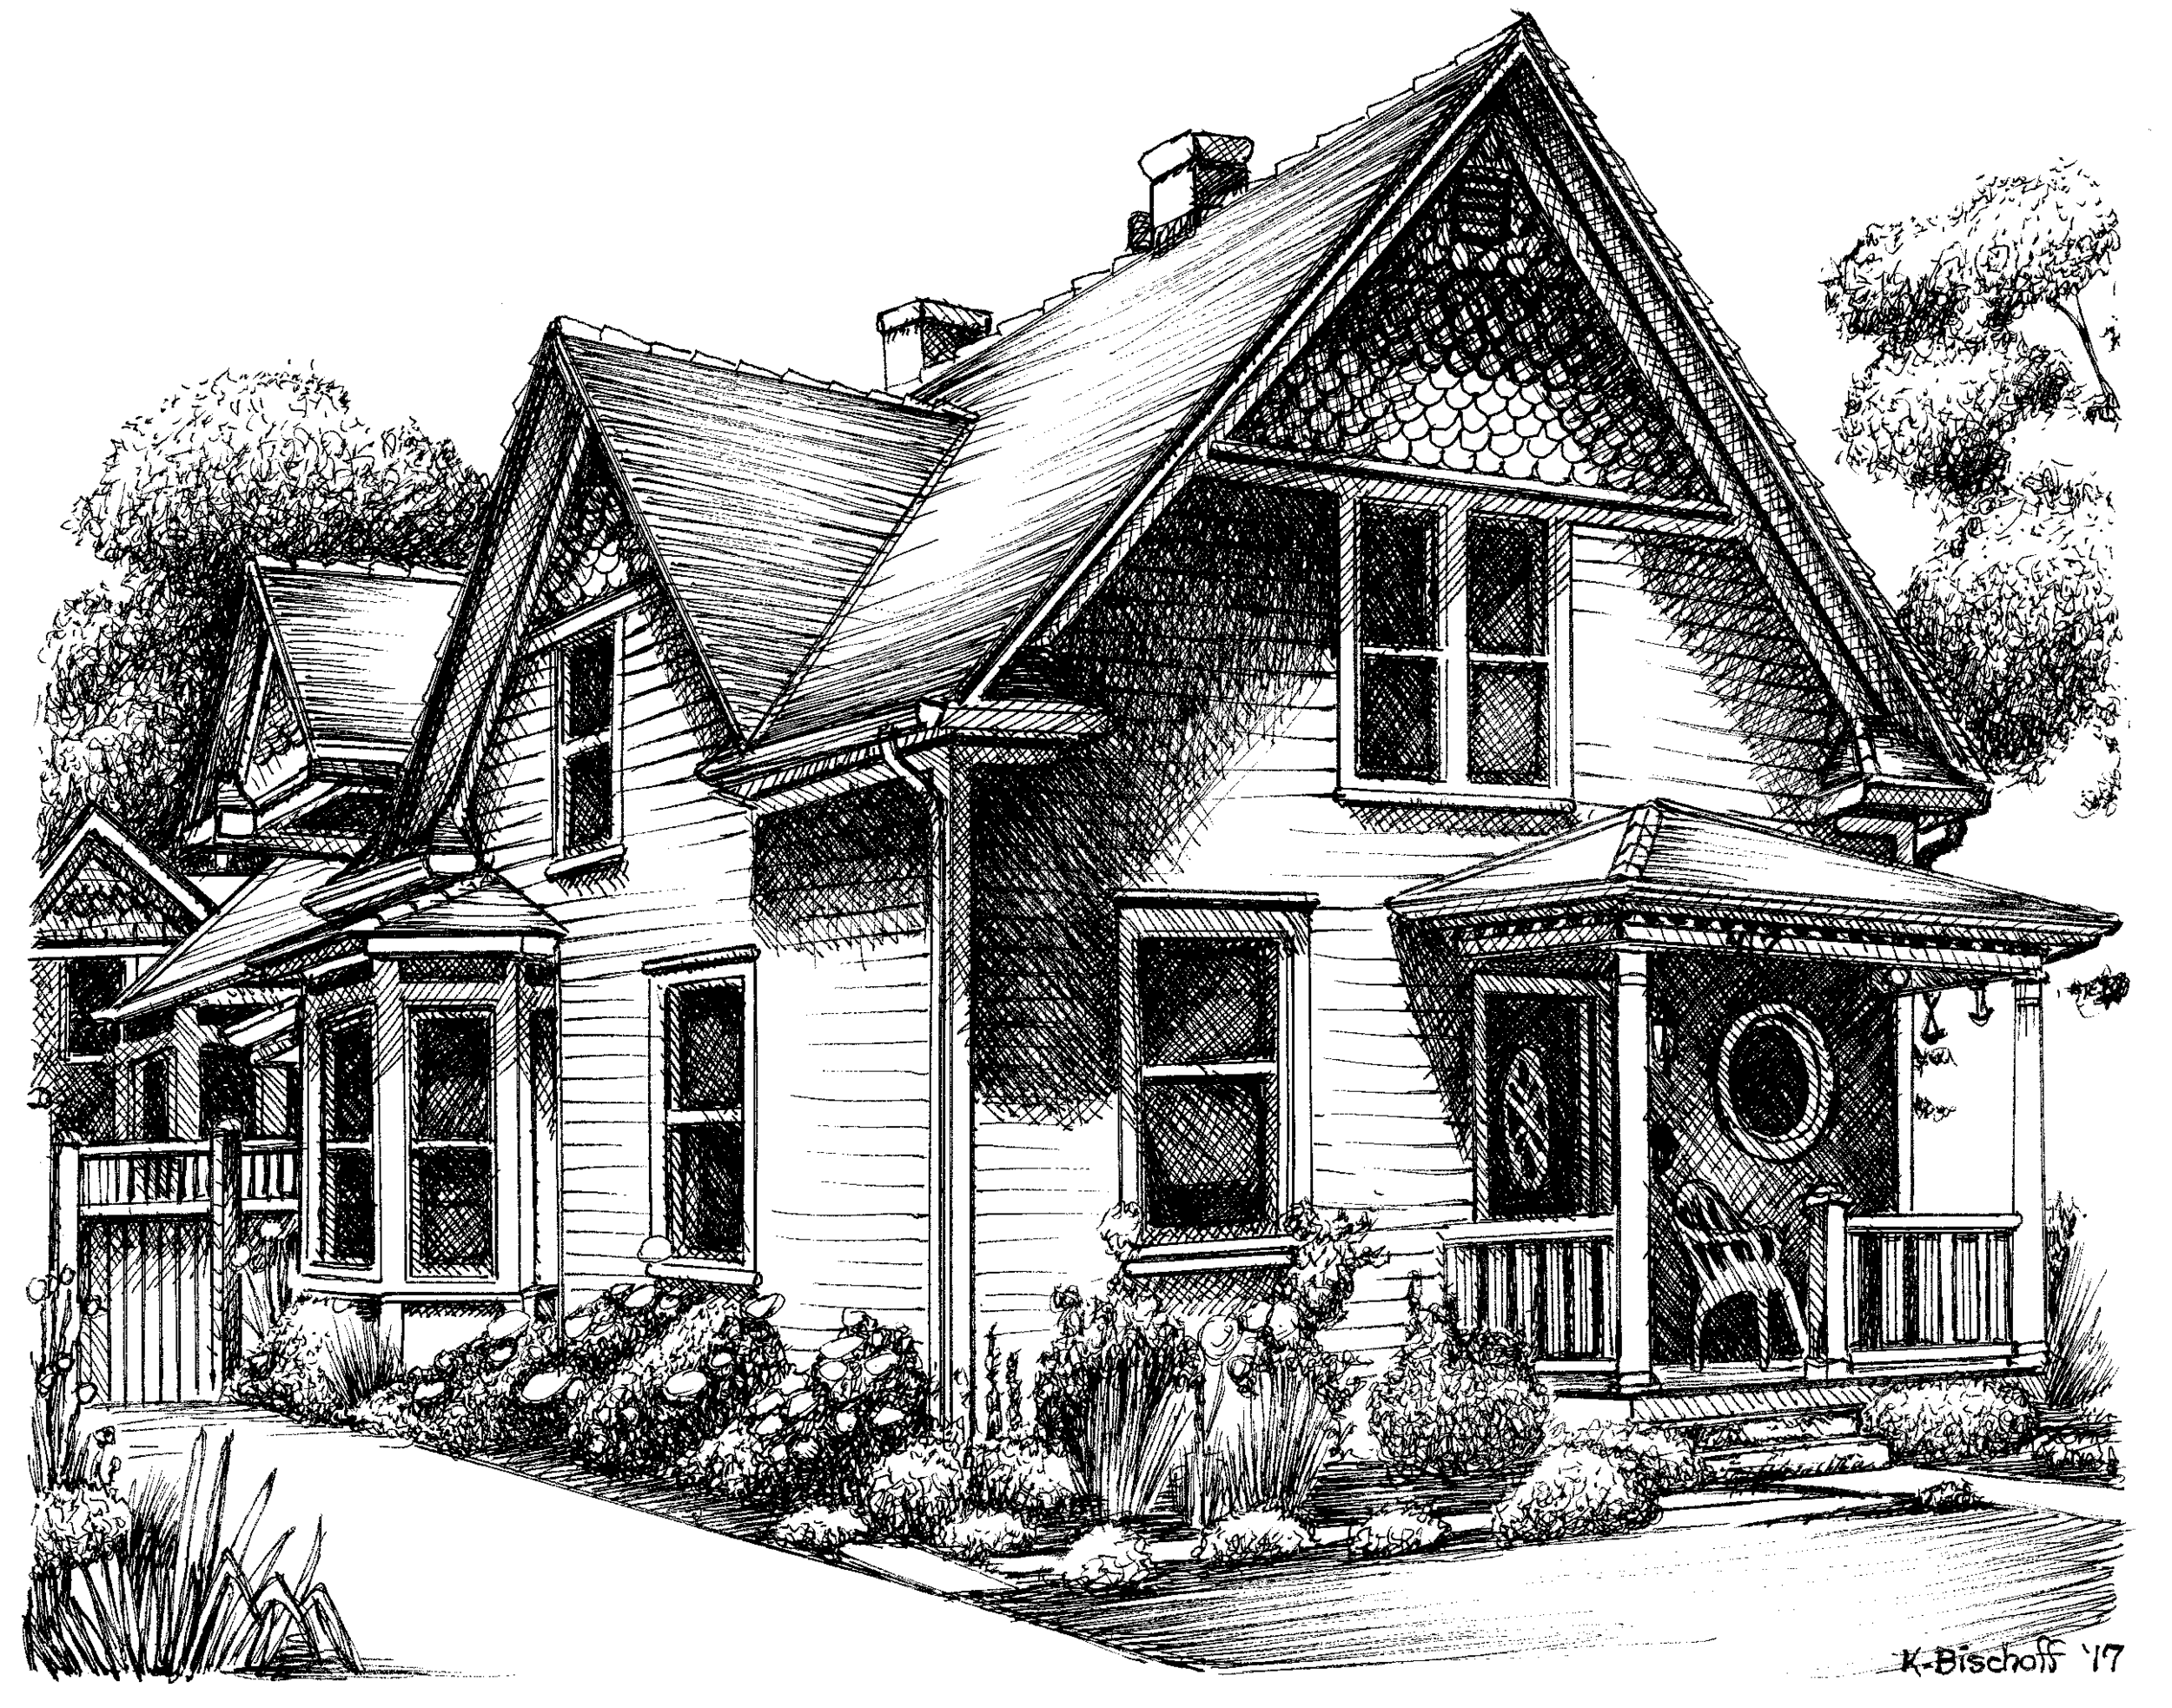 2a Lambert House_417 S Whitcomb.png